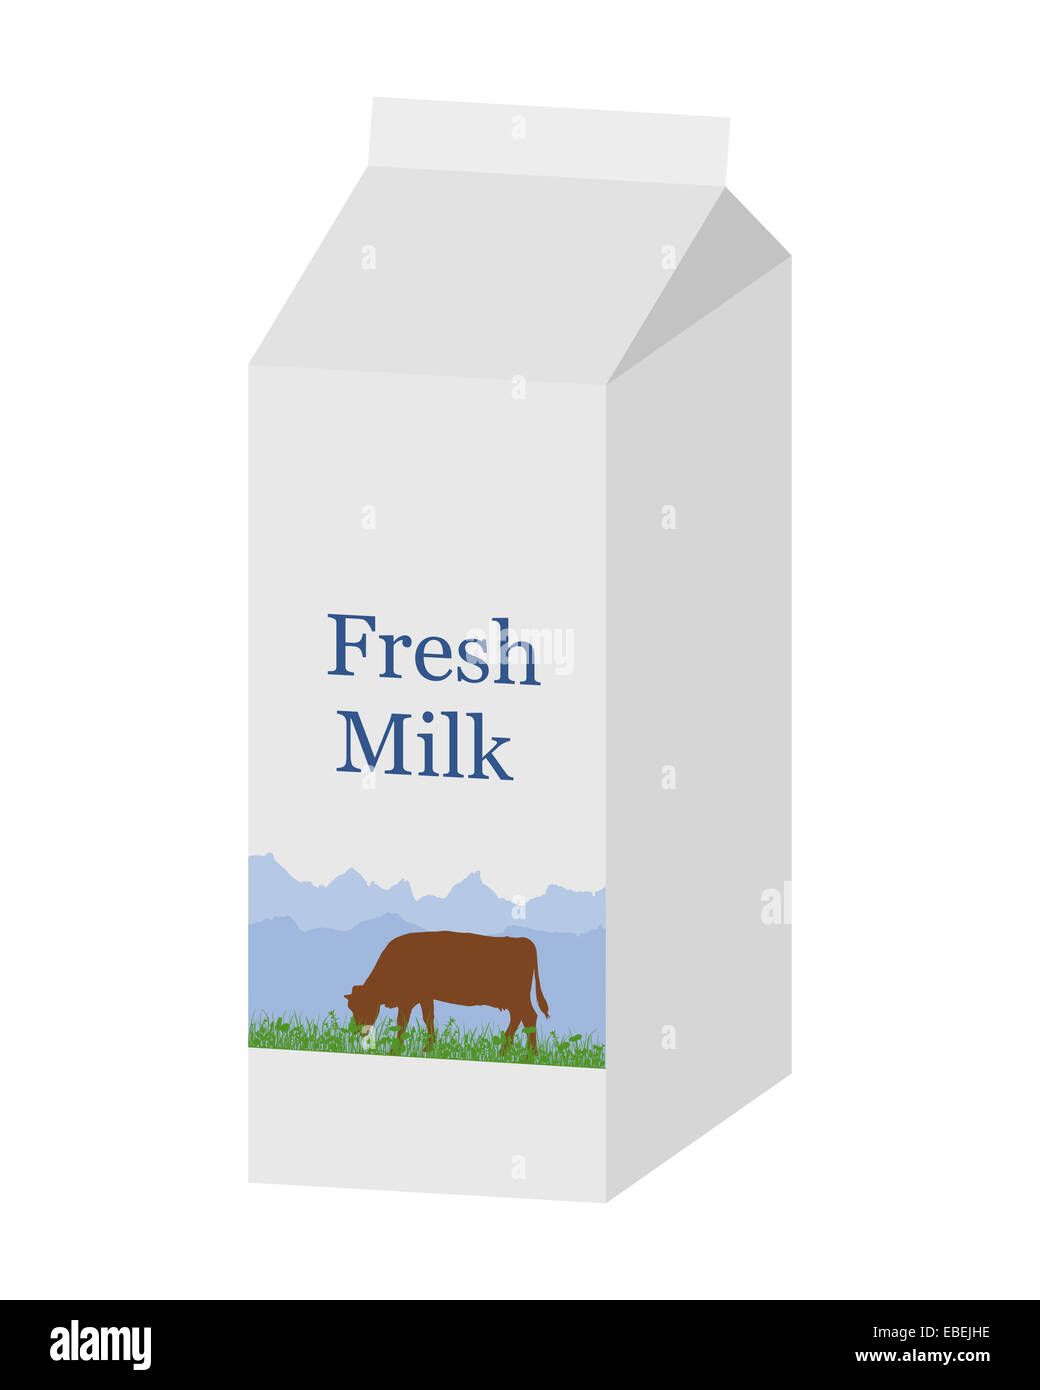 Milk Carton Illustration Stock Photos & Milk Carton Illustration ...